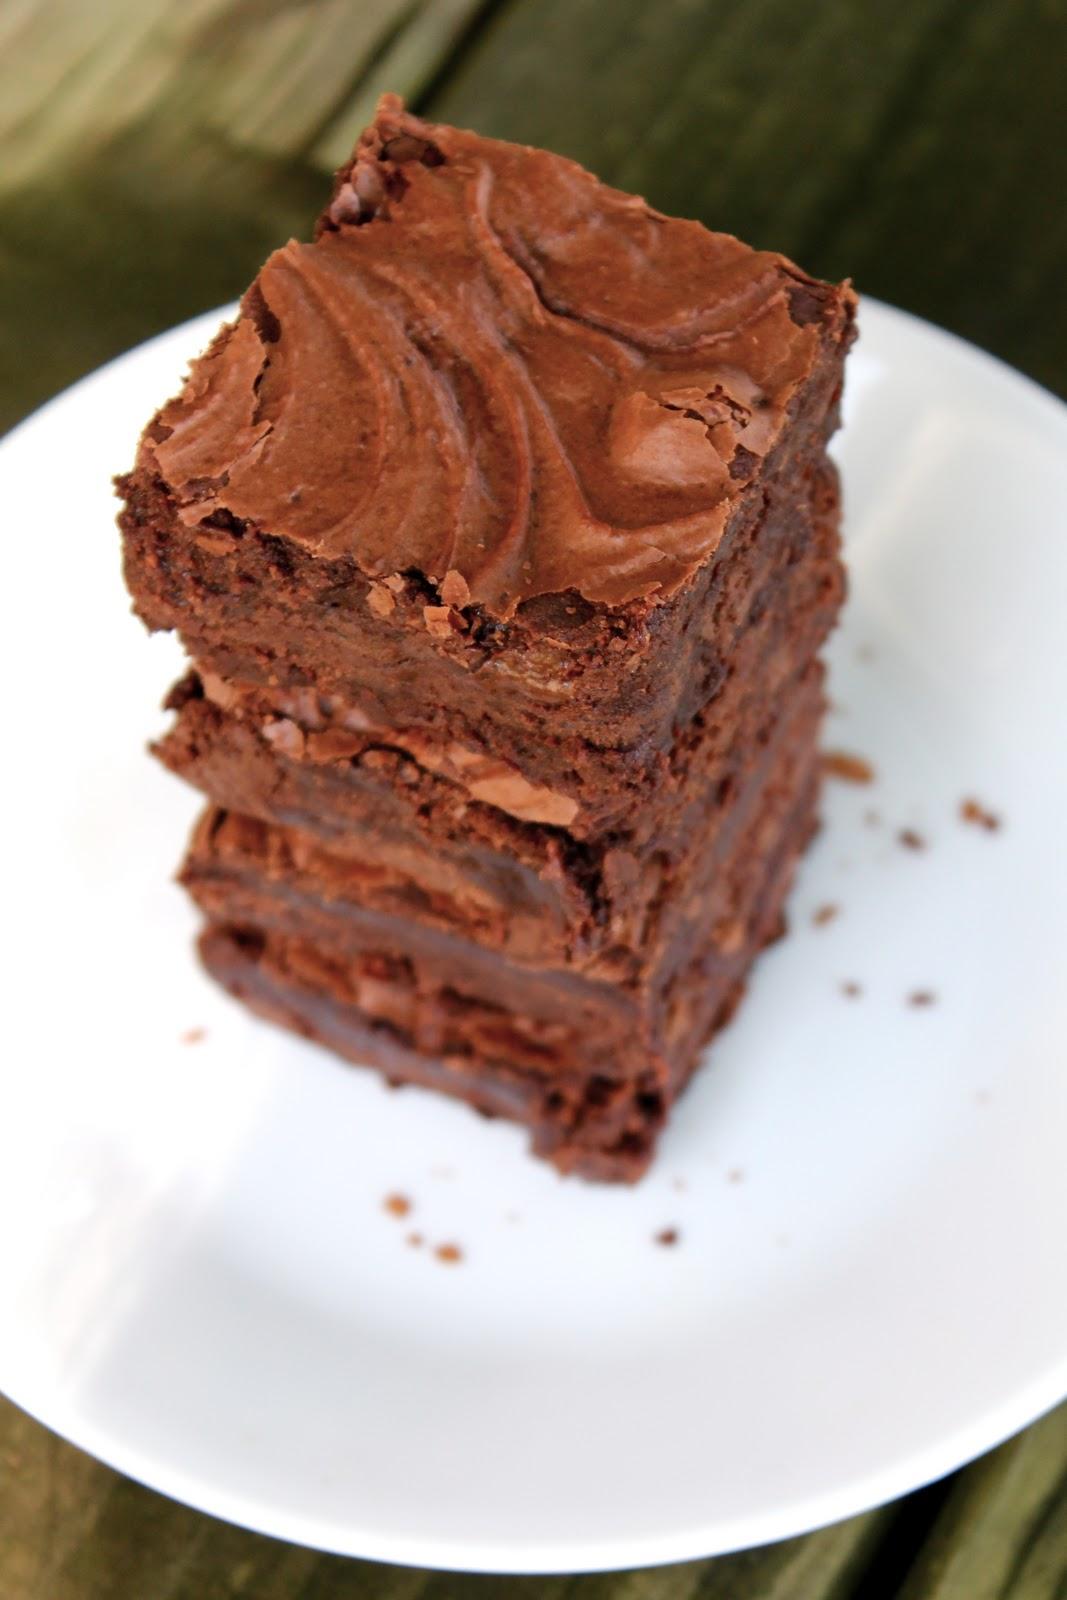 Yammie's Noshery: The Best Fudge Brownies